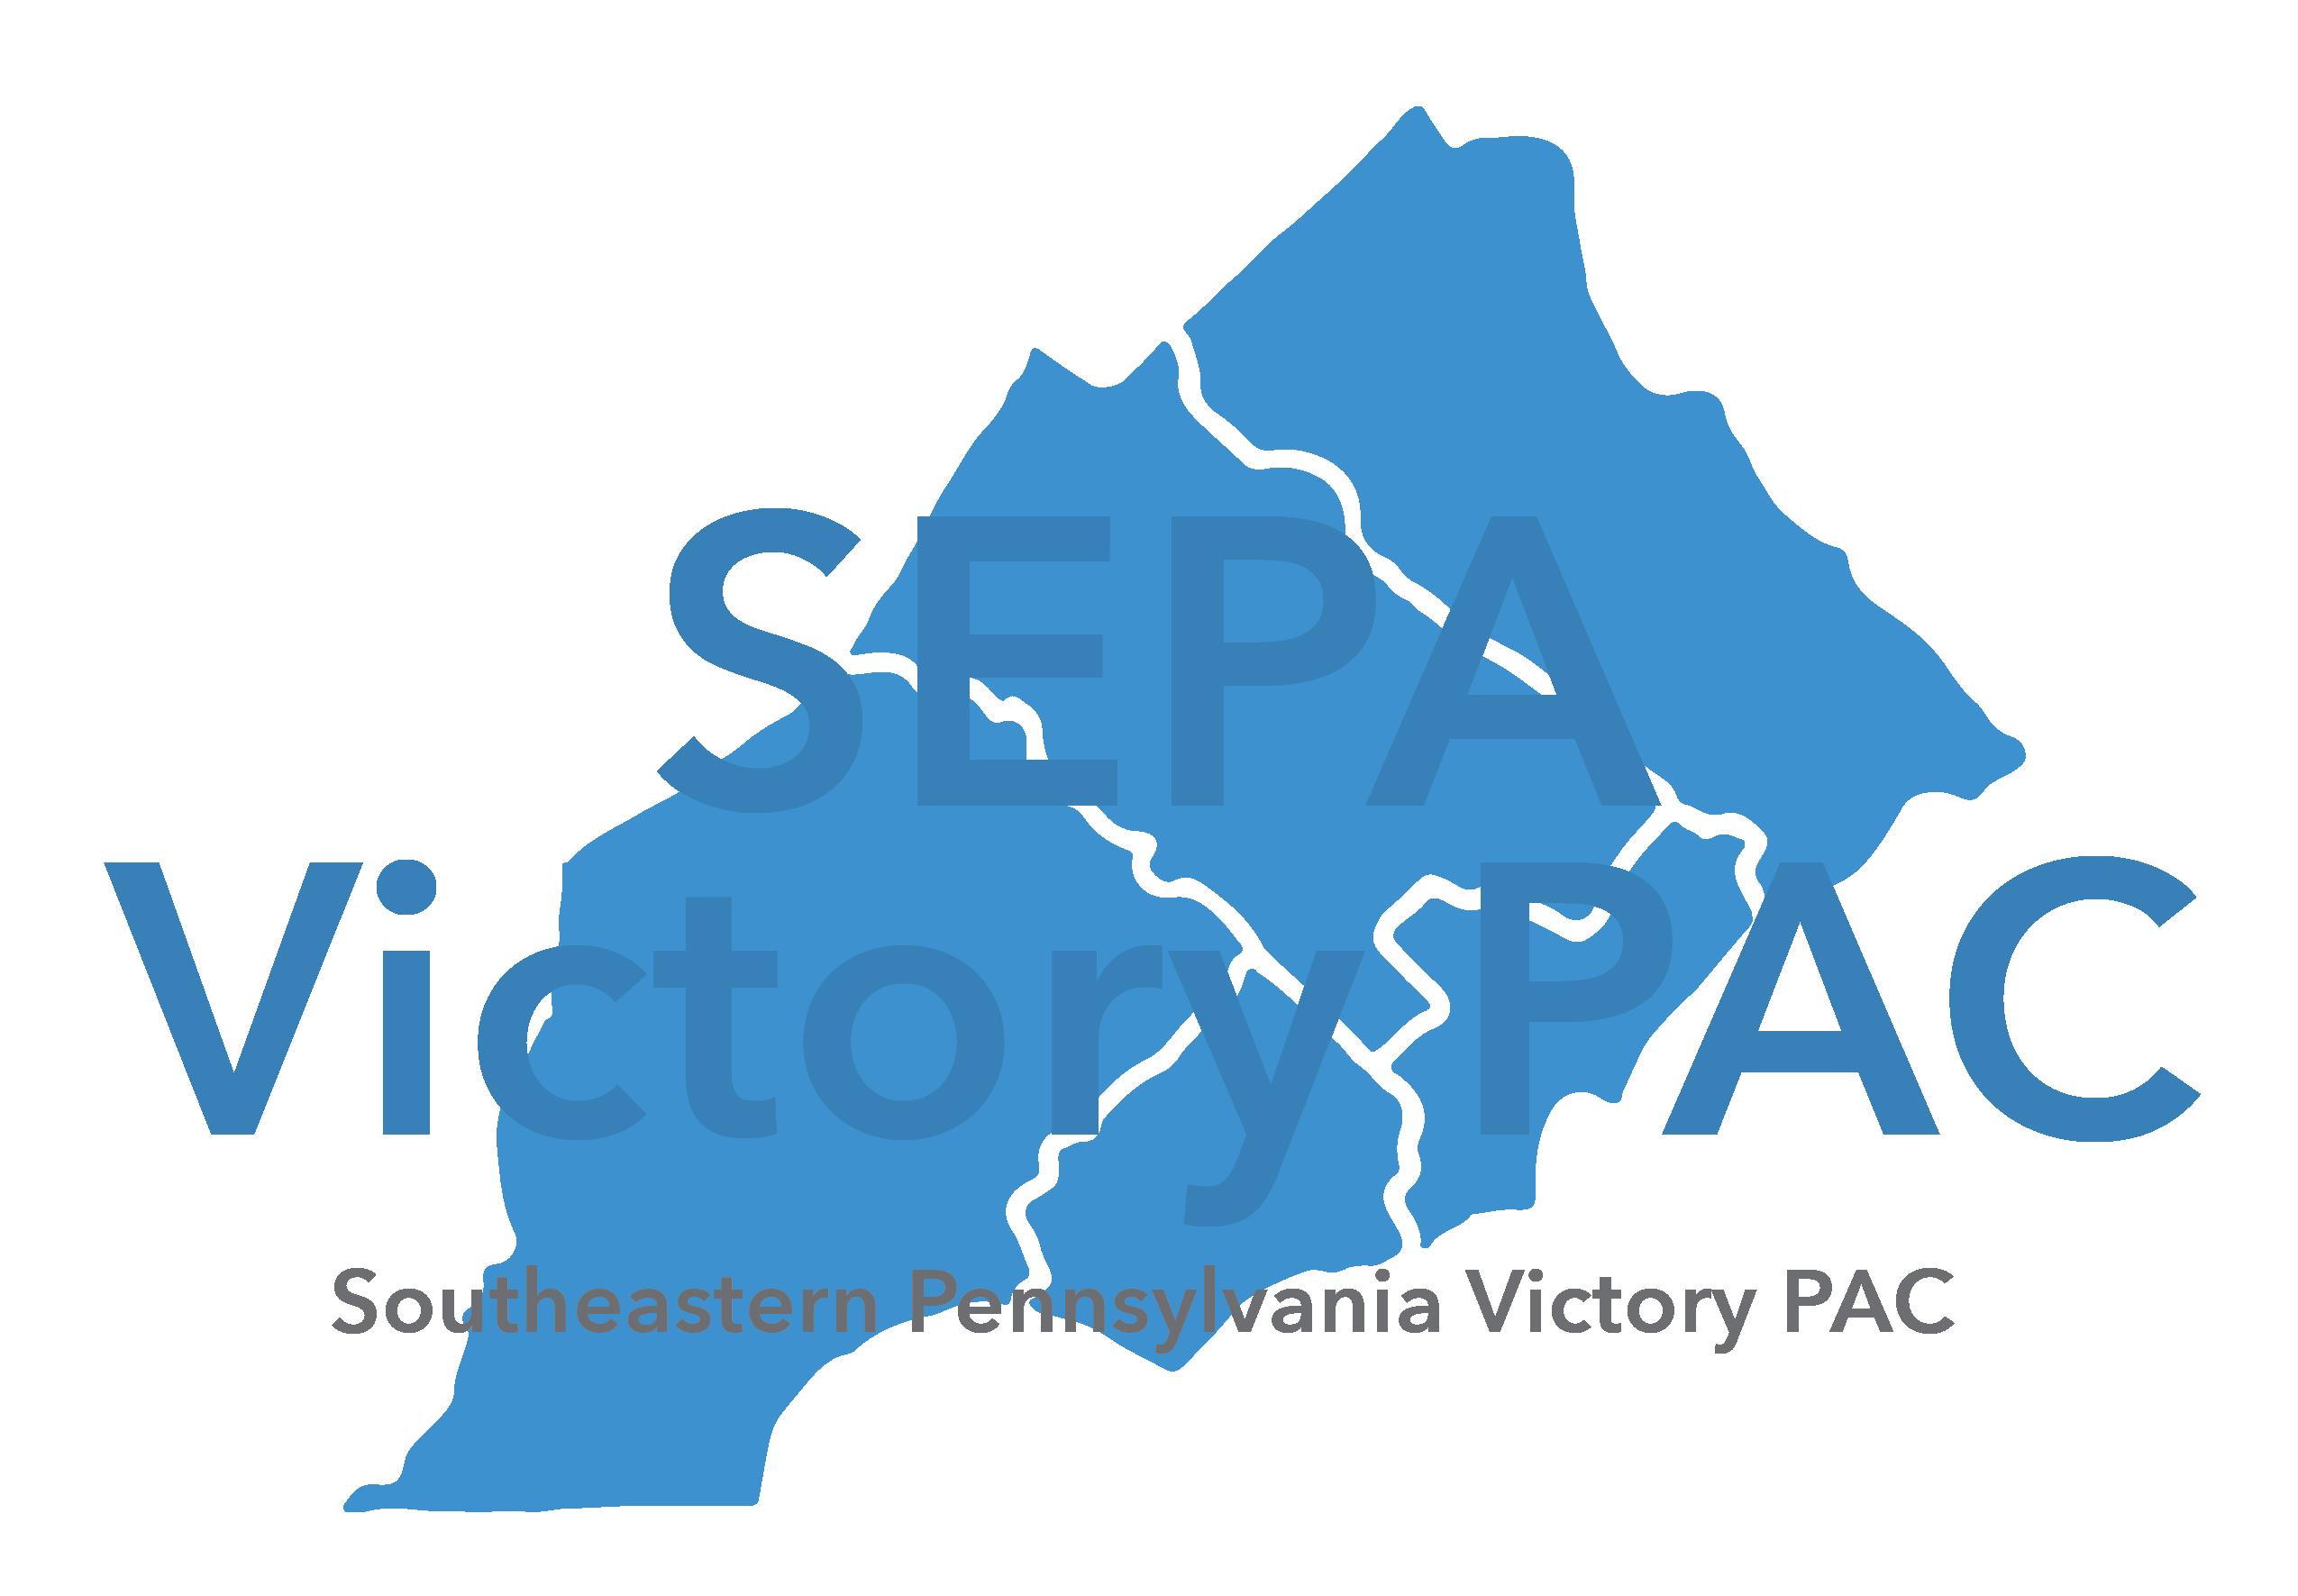 SEPA Victory PAC